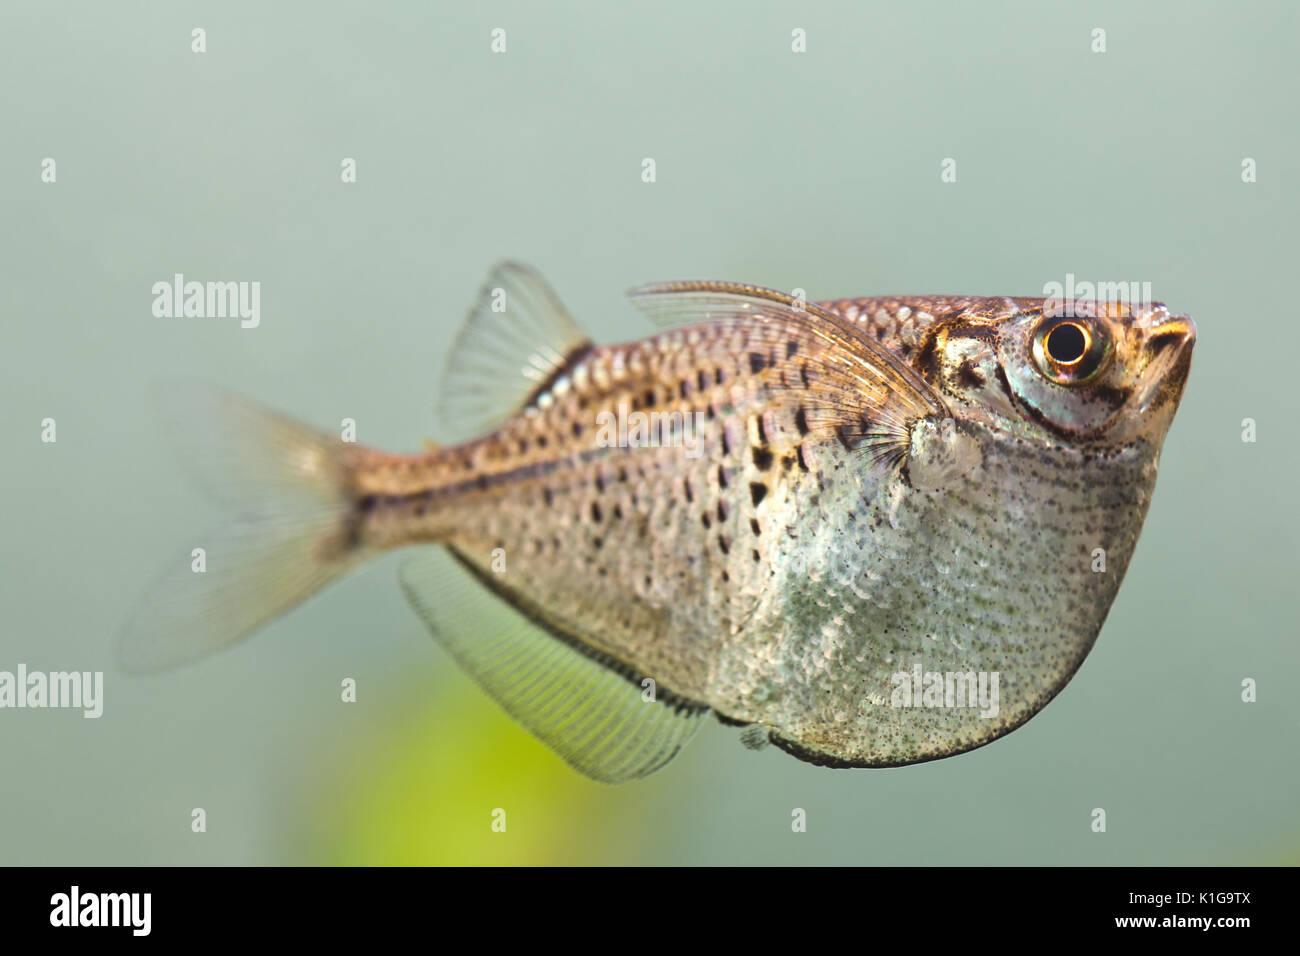 Aquarium fish Gasteropelecus sternicla - Stock Image